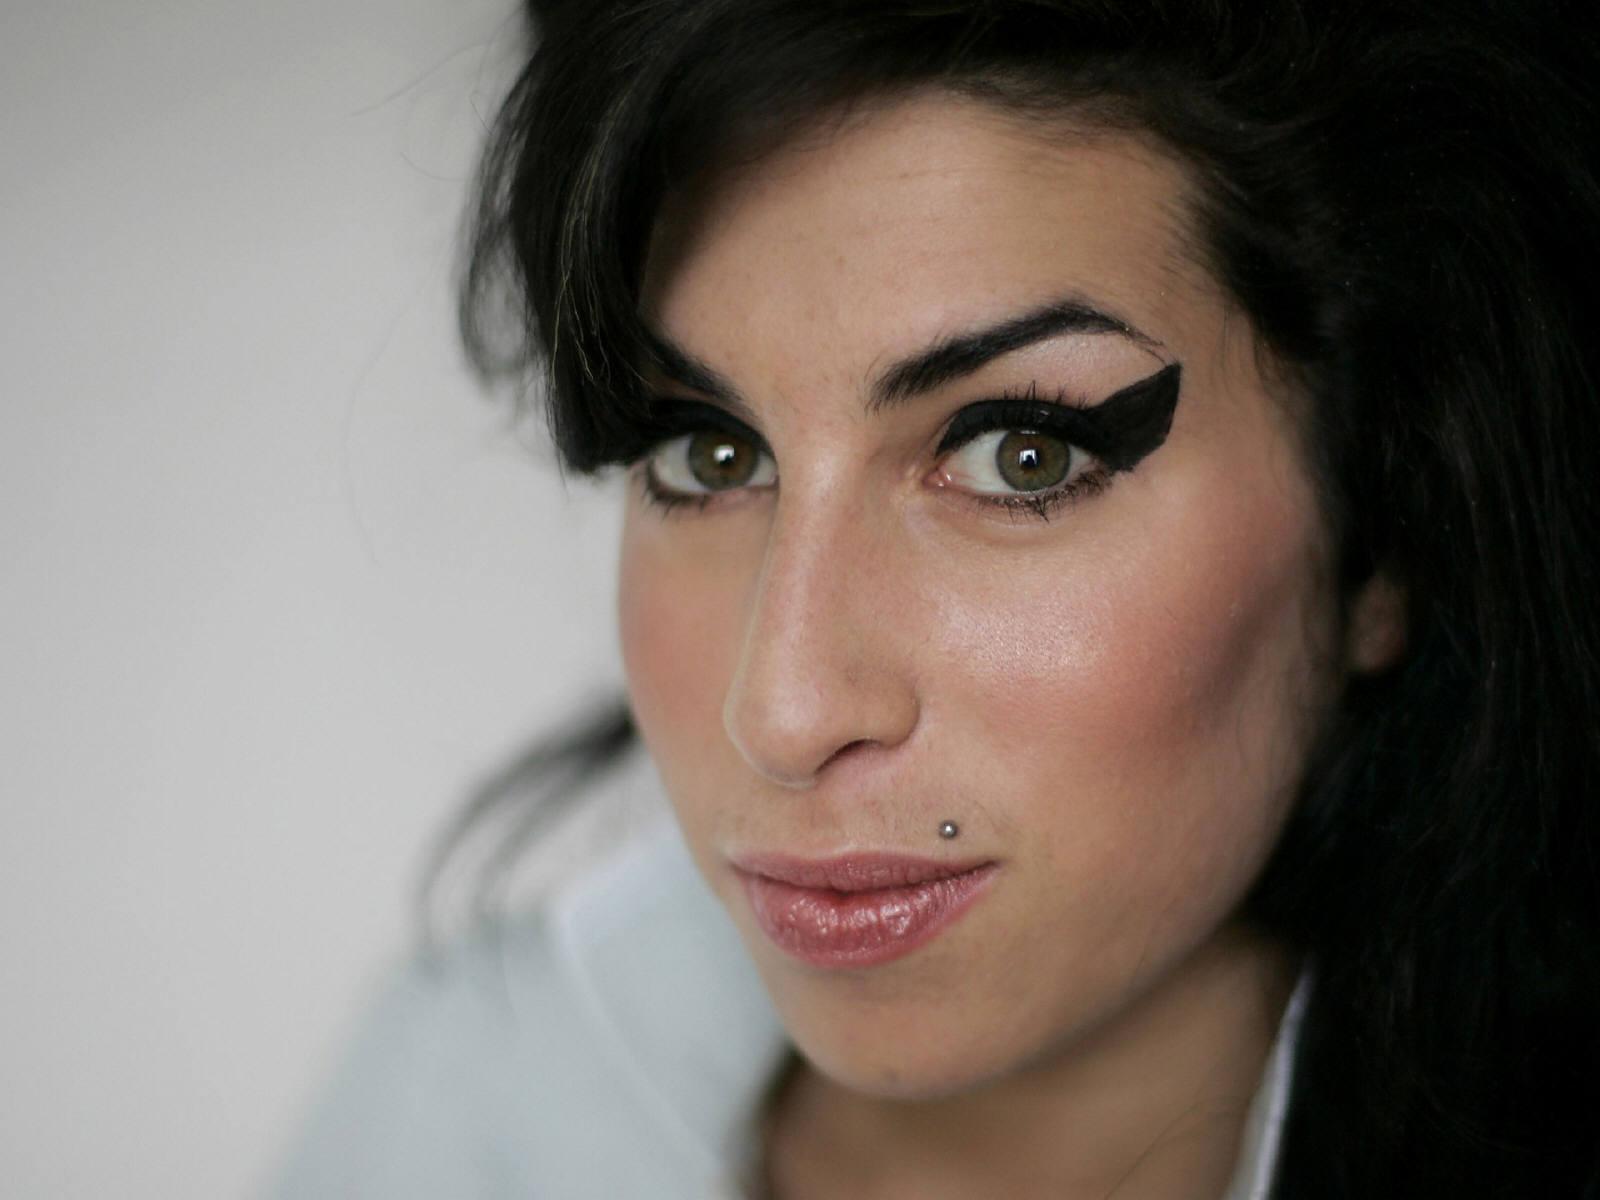 http://1.bp.blogspot.com/-v5uPTnxL-Bc/T5jUwtDplxI/AAAAAAAAB3M/YjXMXHcfChY/s1600/Amy_Winehouse_0004_1600X1200_Wallpaper.jpg